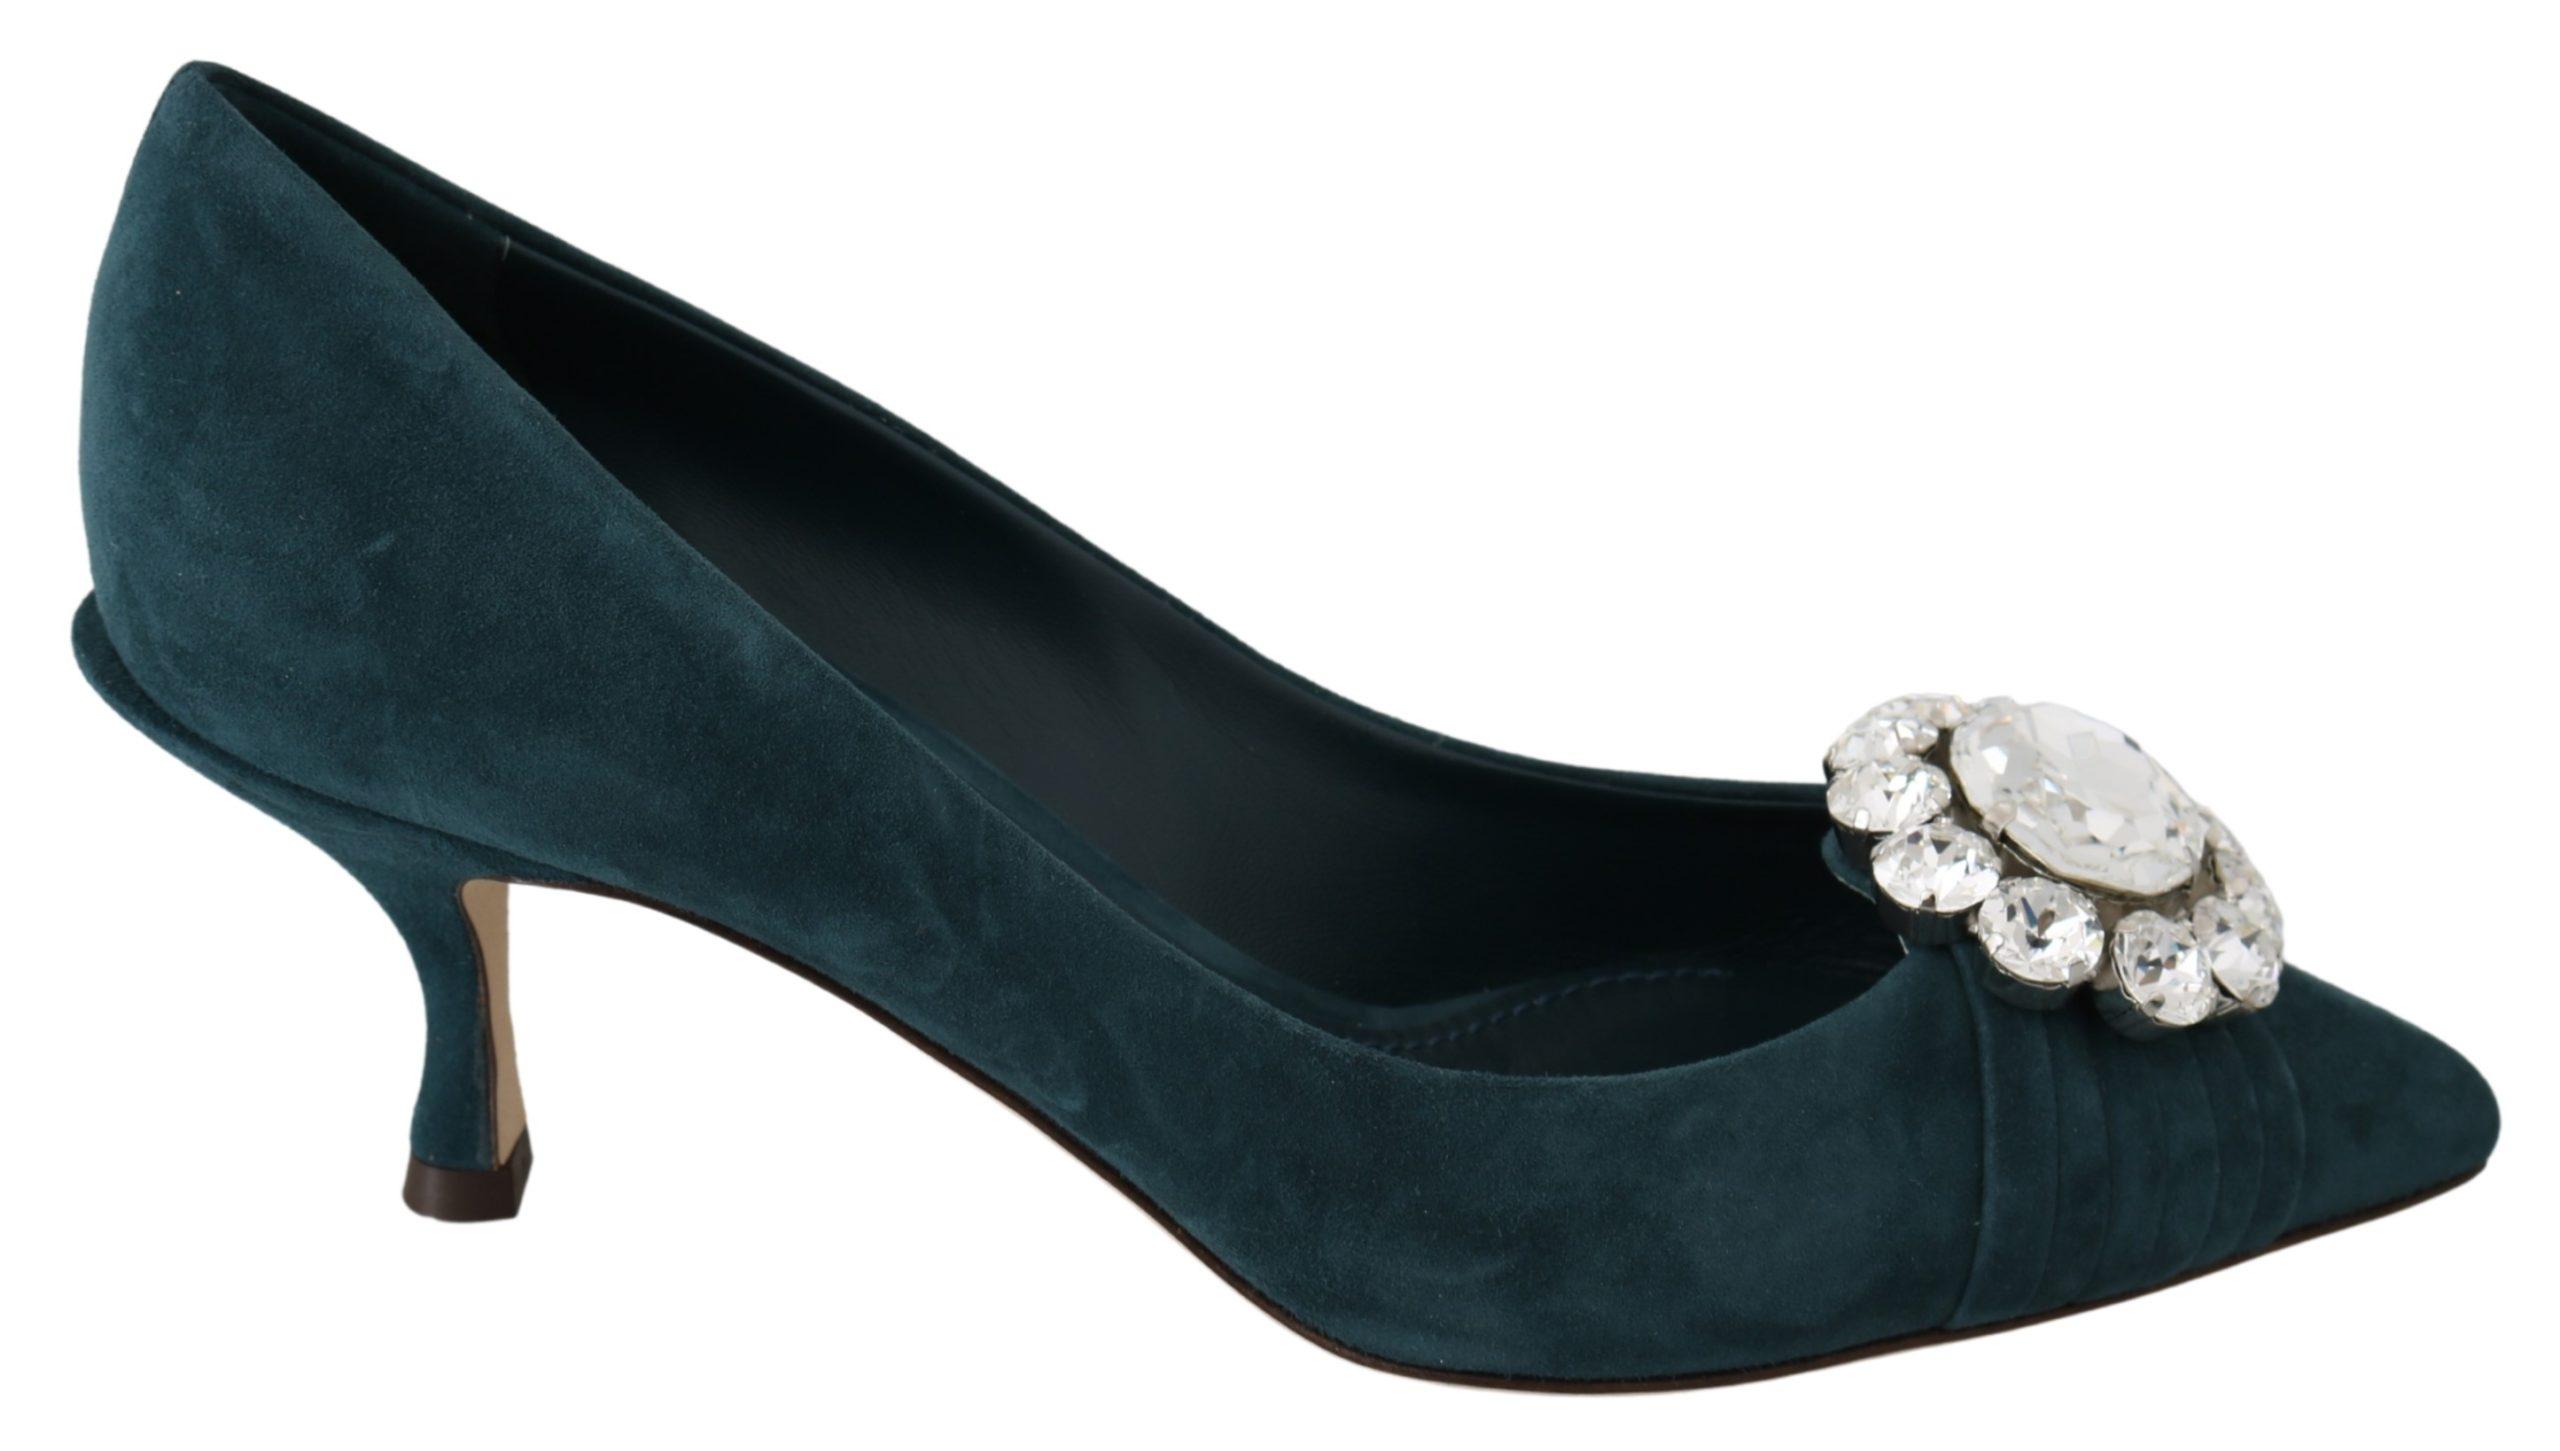 Dolce & Gabbana Women's Suede Crystals Pumps Blue LA7228 - EU39/US8.5